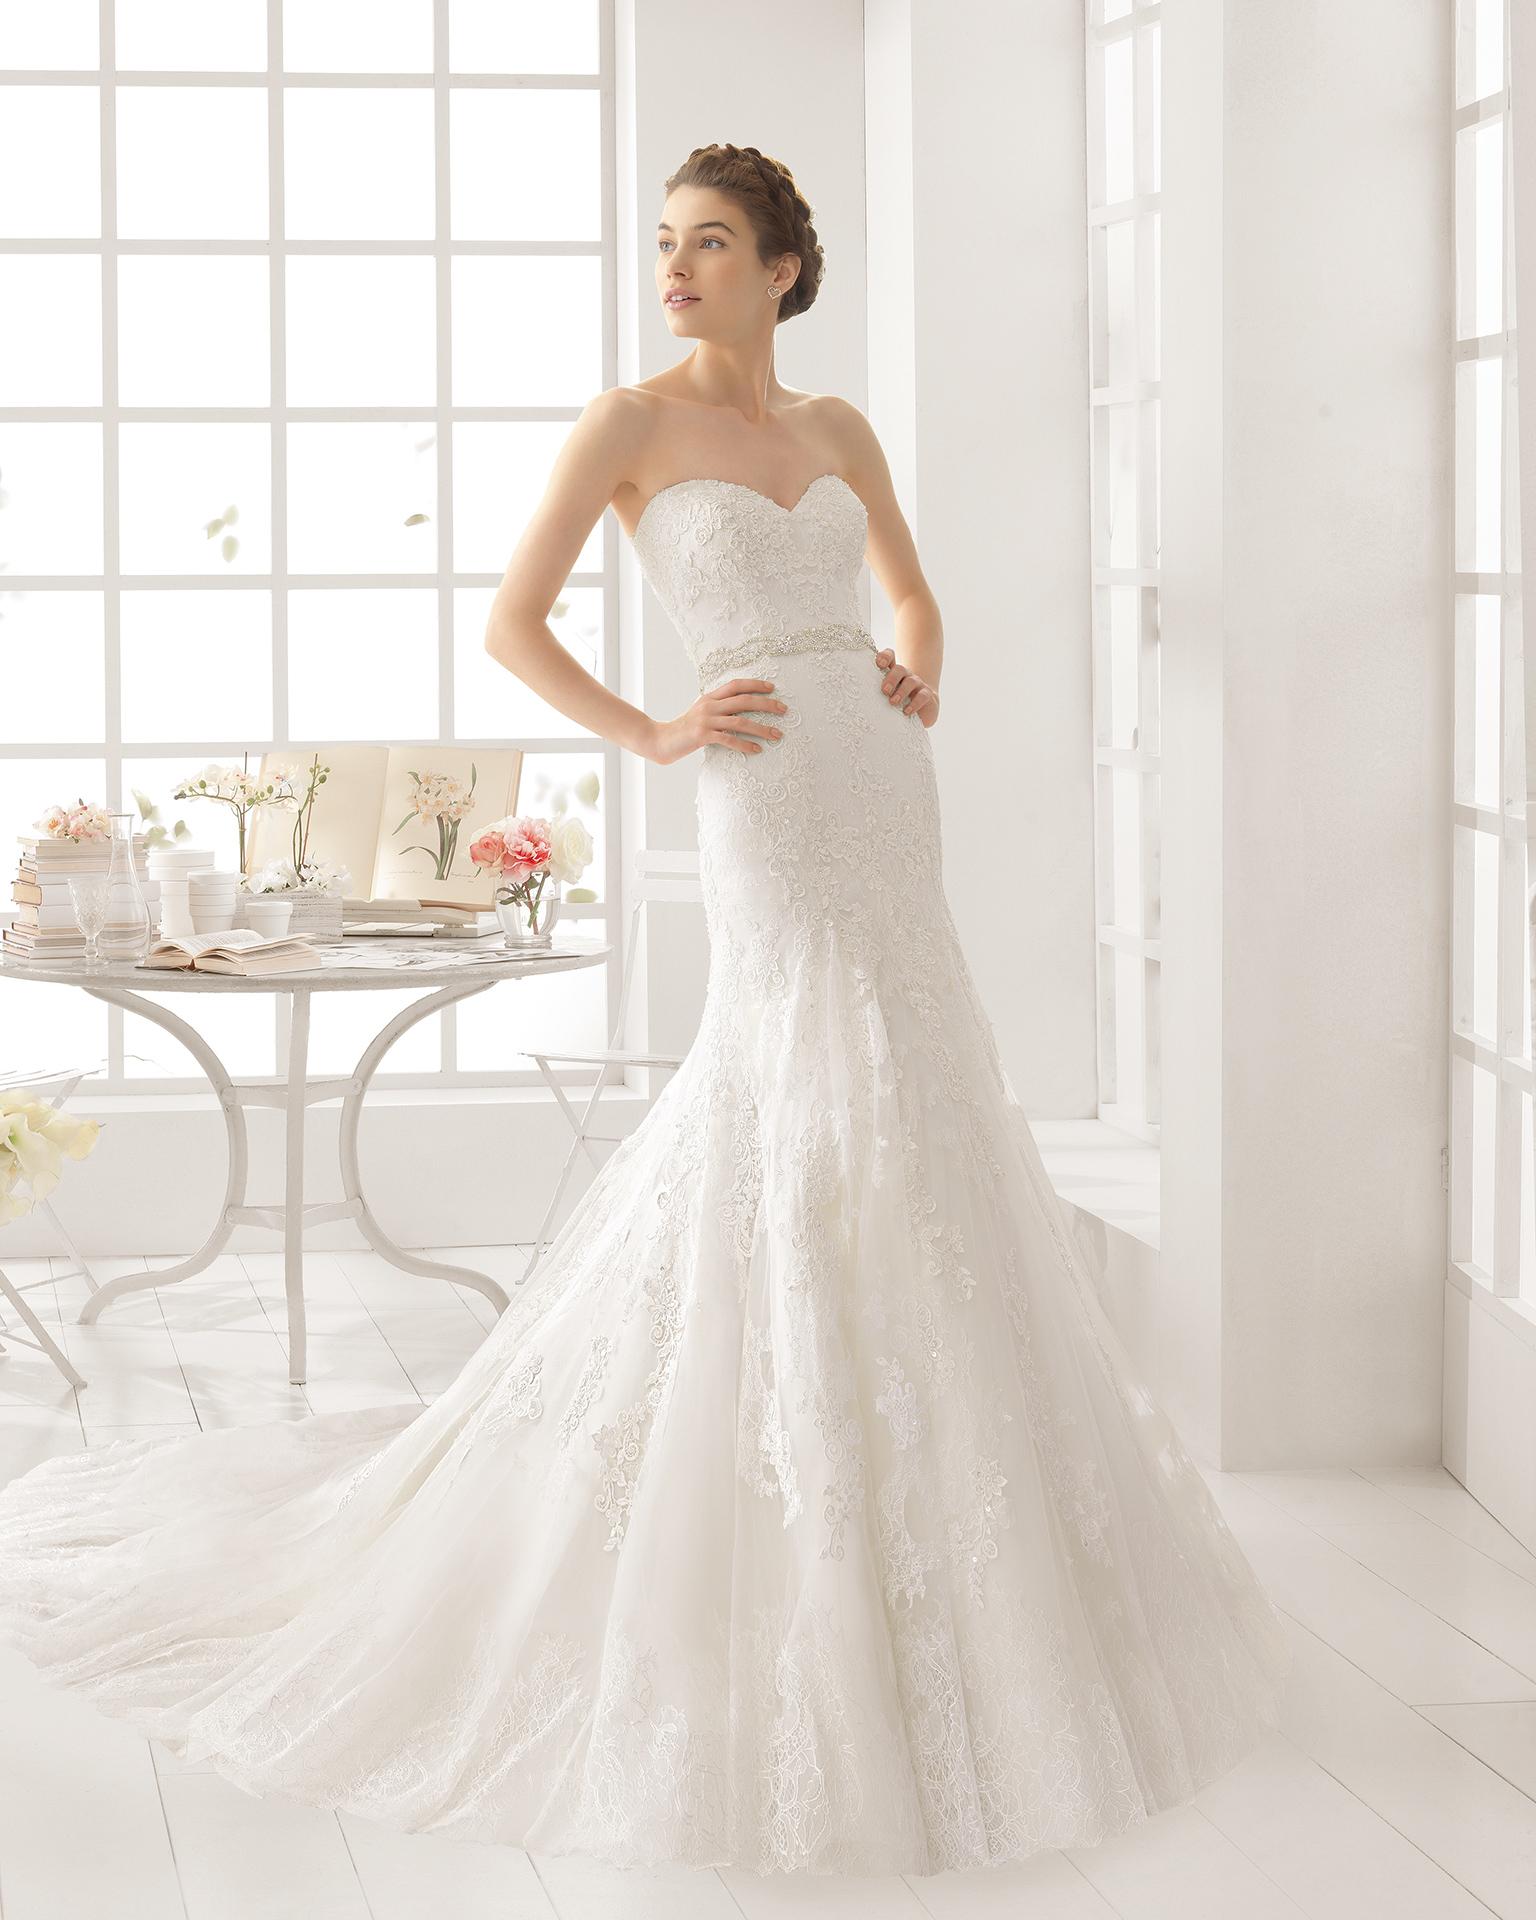 Robe de mariée ALPES en dentelle avec pierreries.